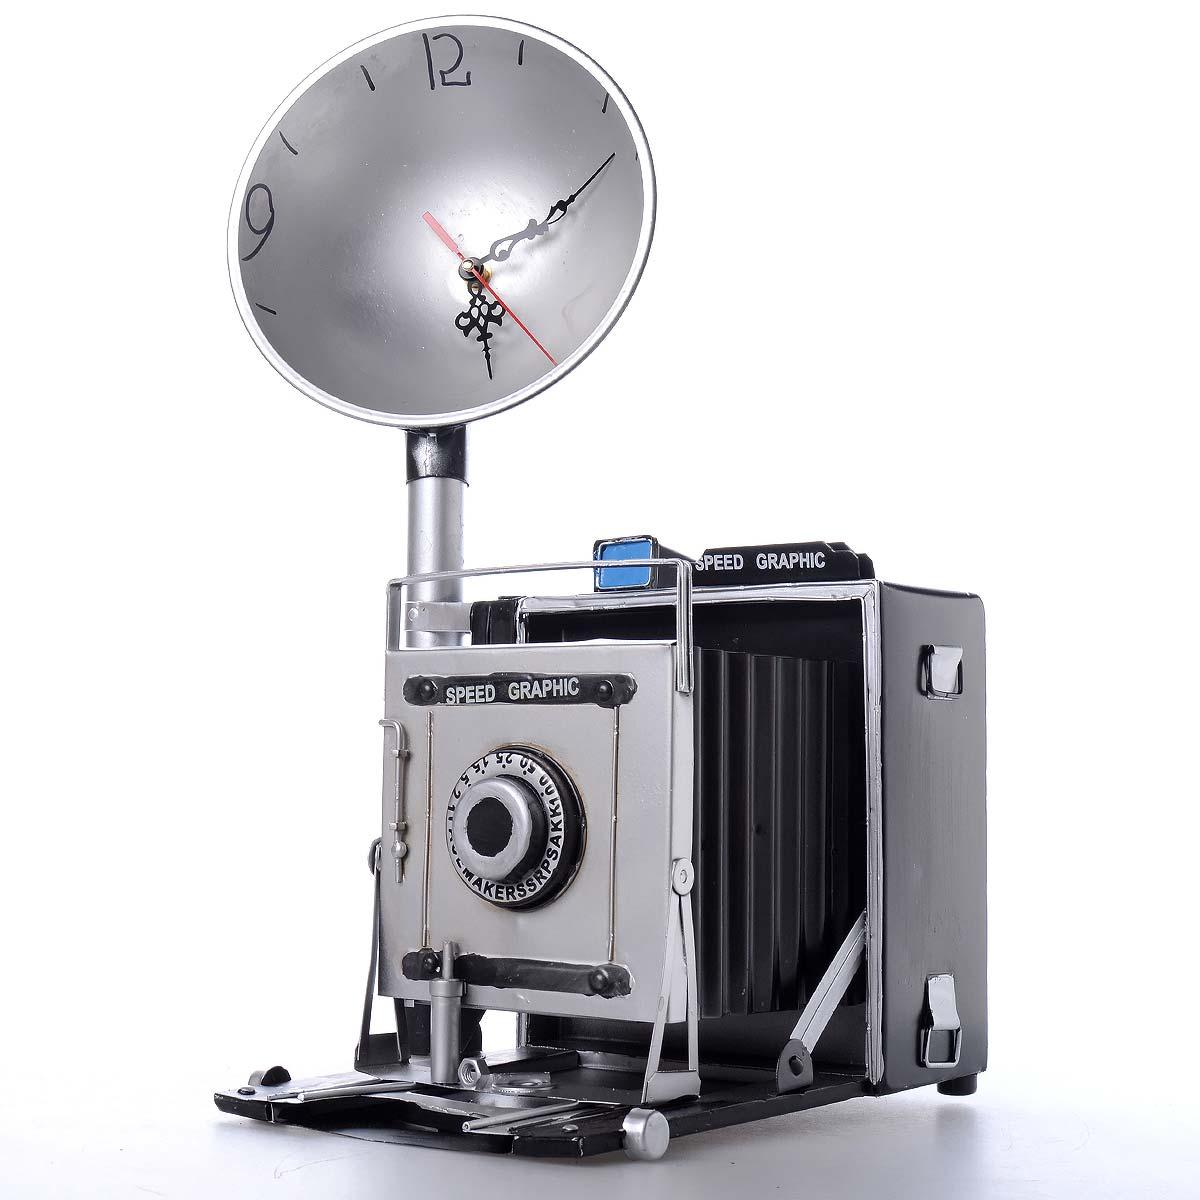 Vintage χειροποίητο διακοσμητικό ρολόι σε στυλ φωτογραφικής μηχανής - OEM 51561